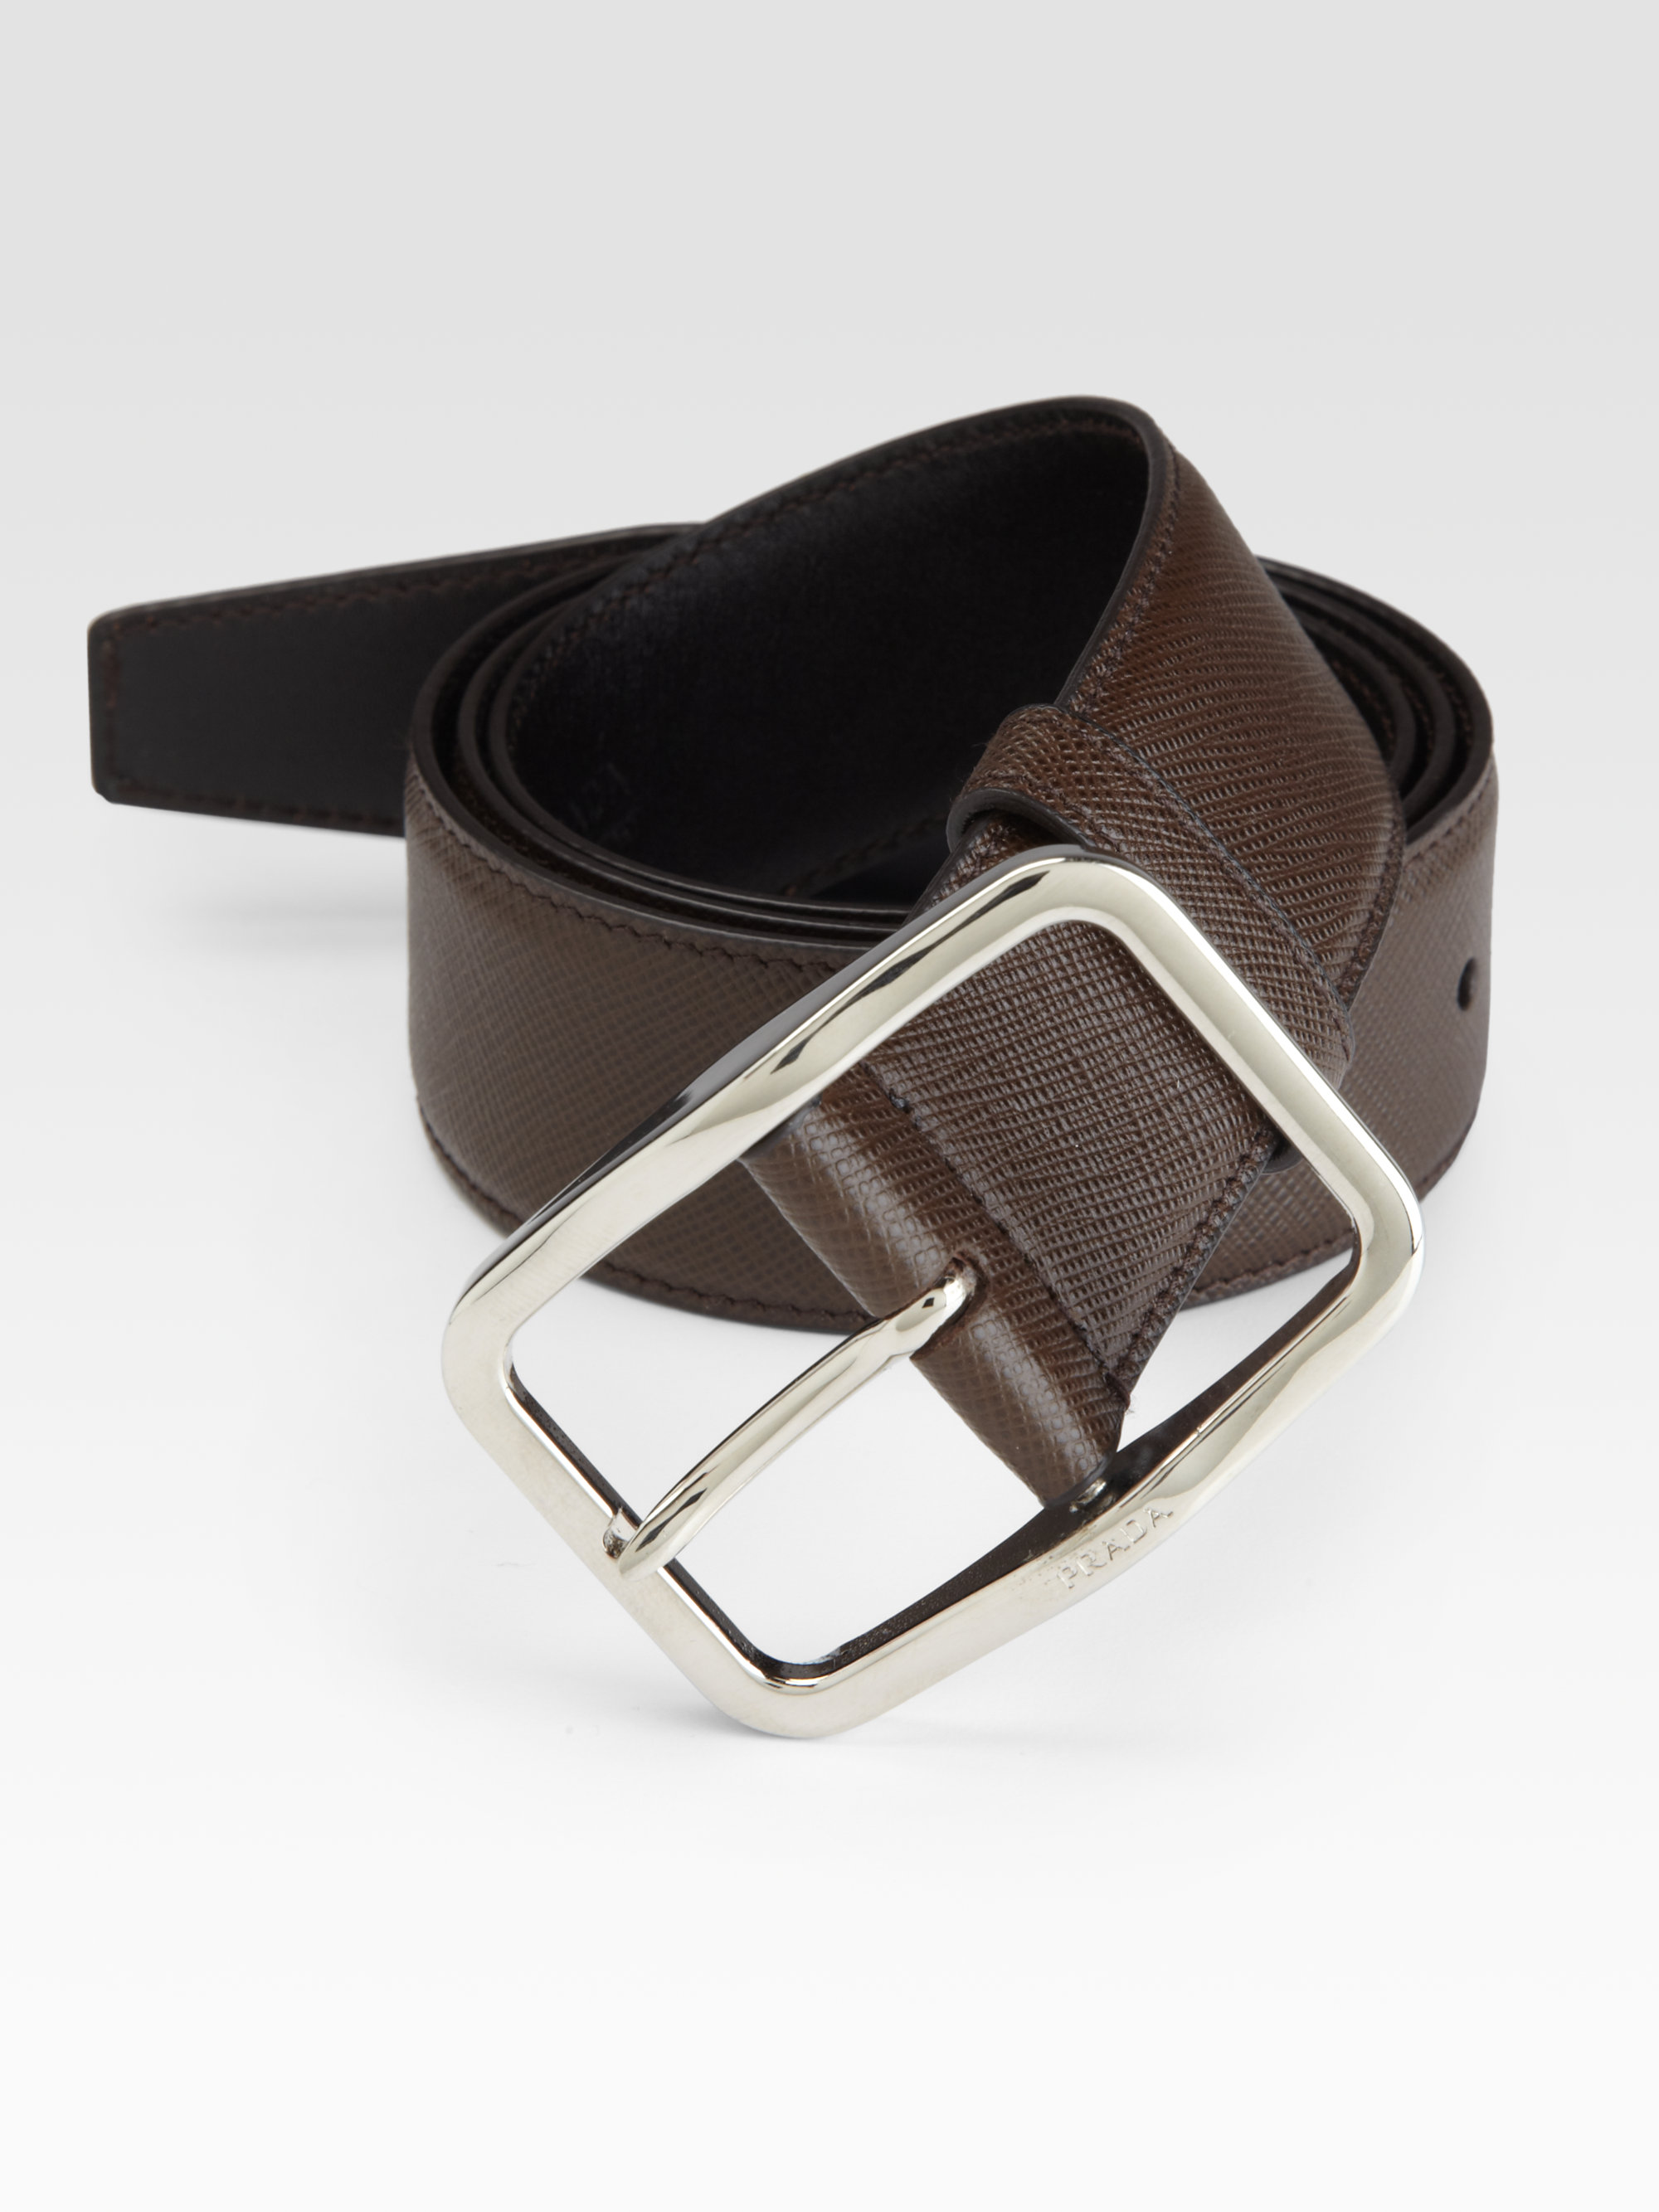 Prada Saffiano Leather Belt In Brown For Men